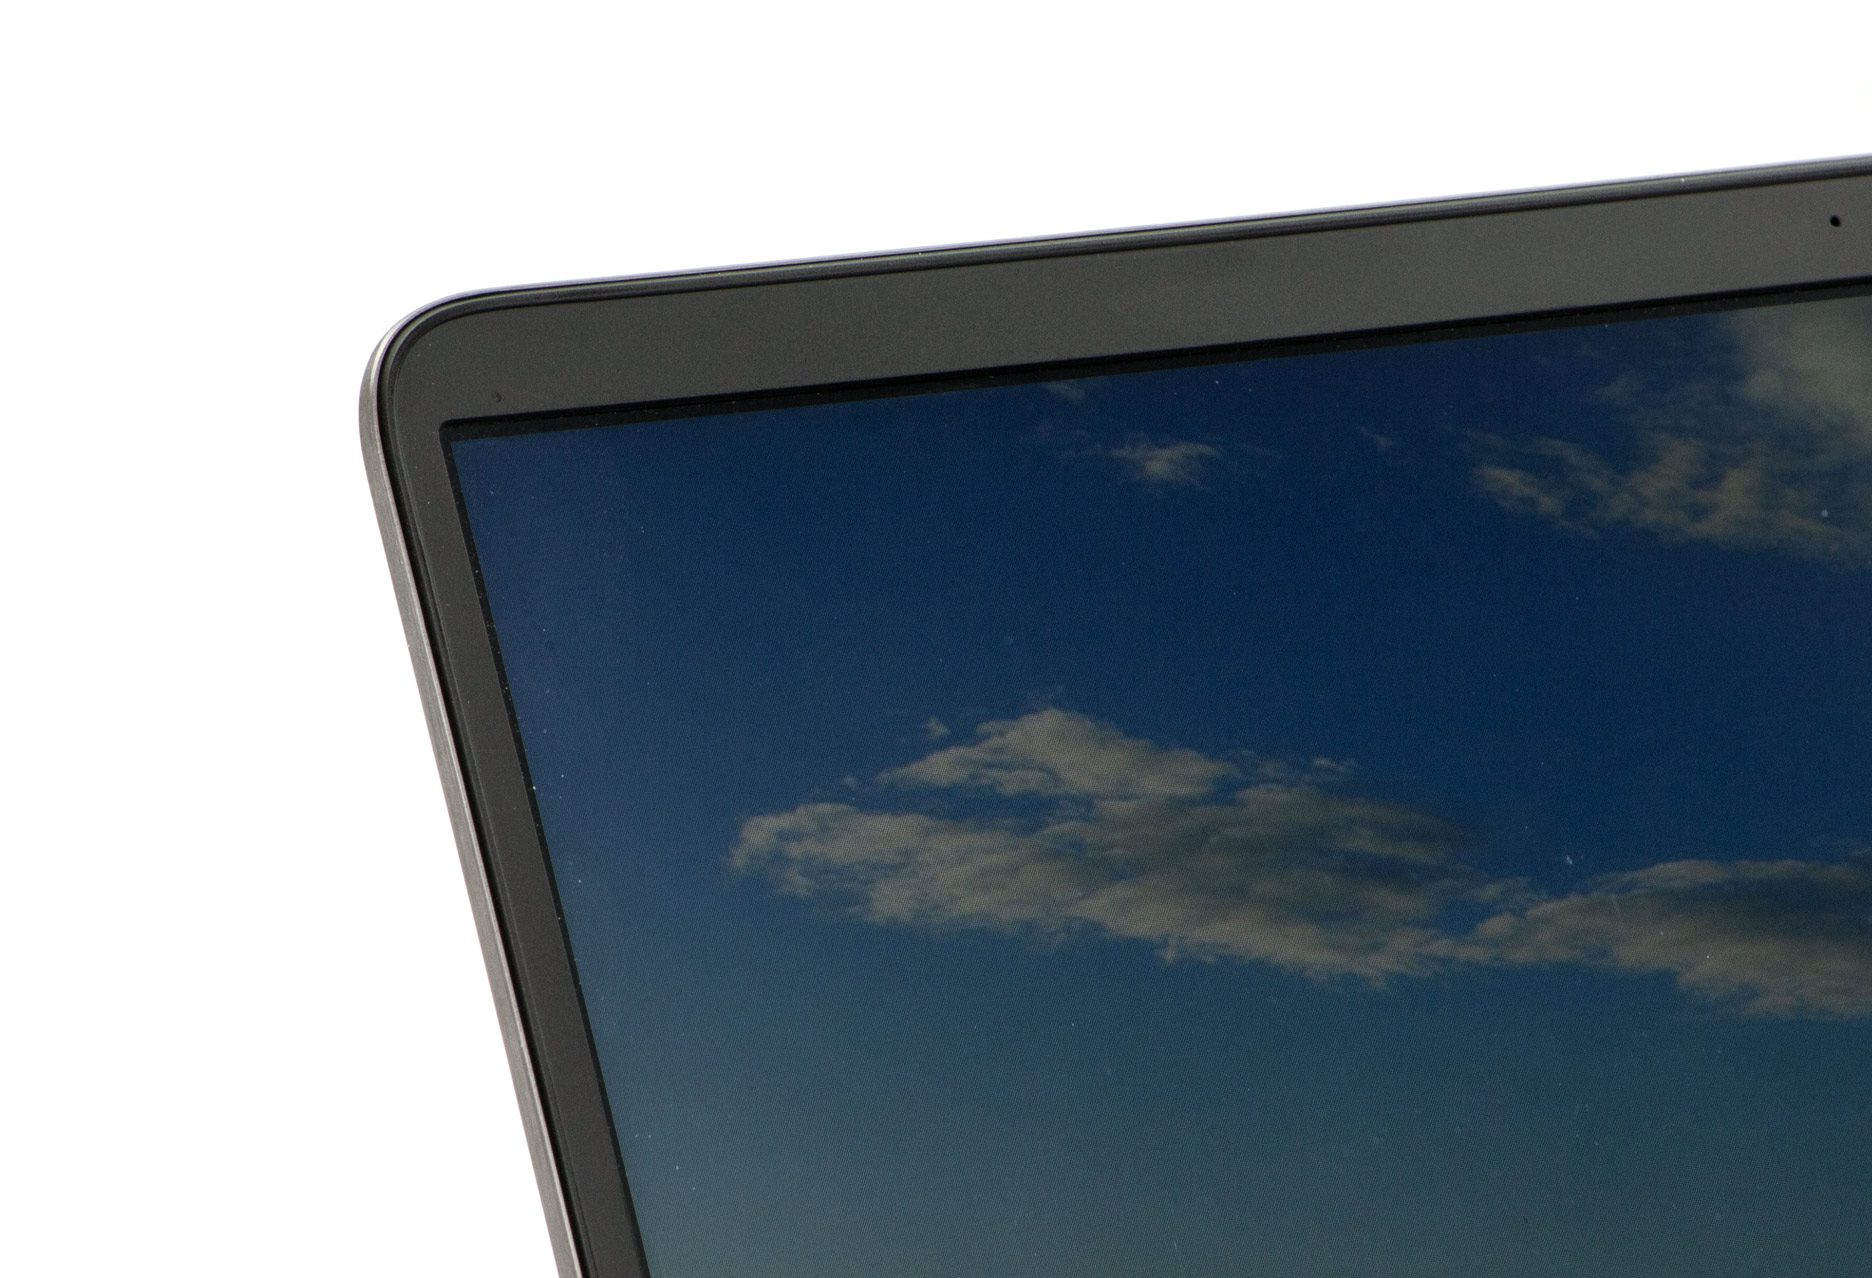 Asus Zenbook UX410UQ-GV031T ramka ekranu